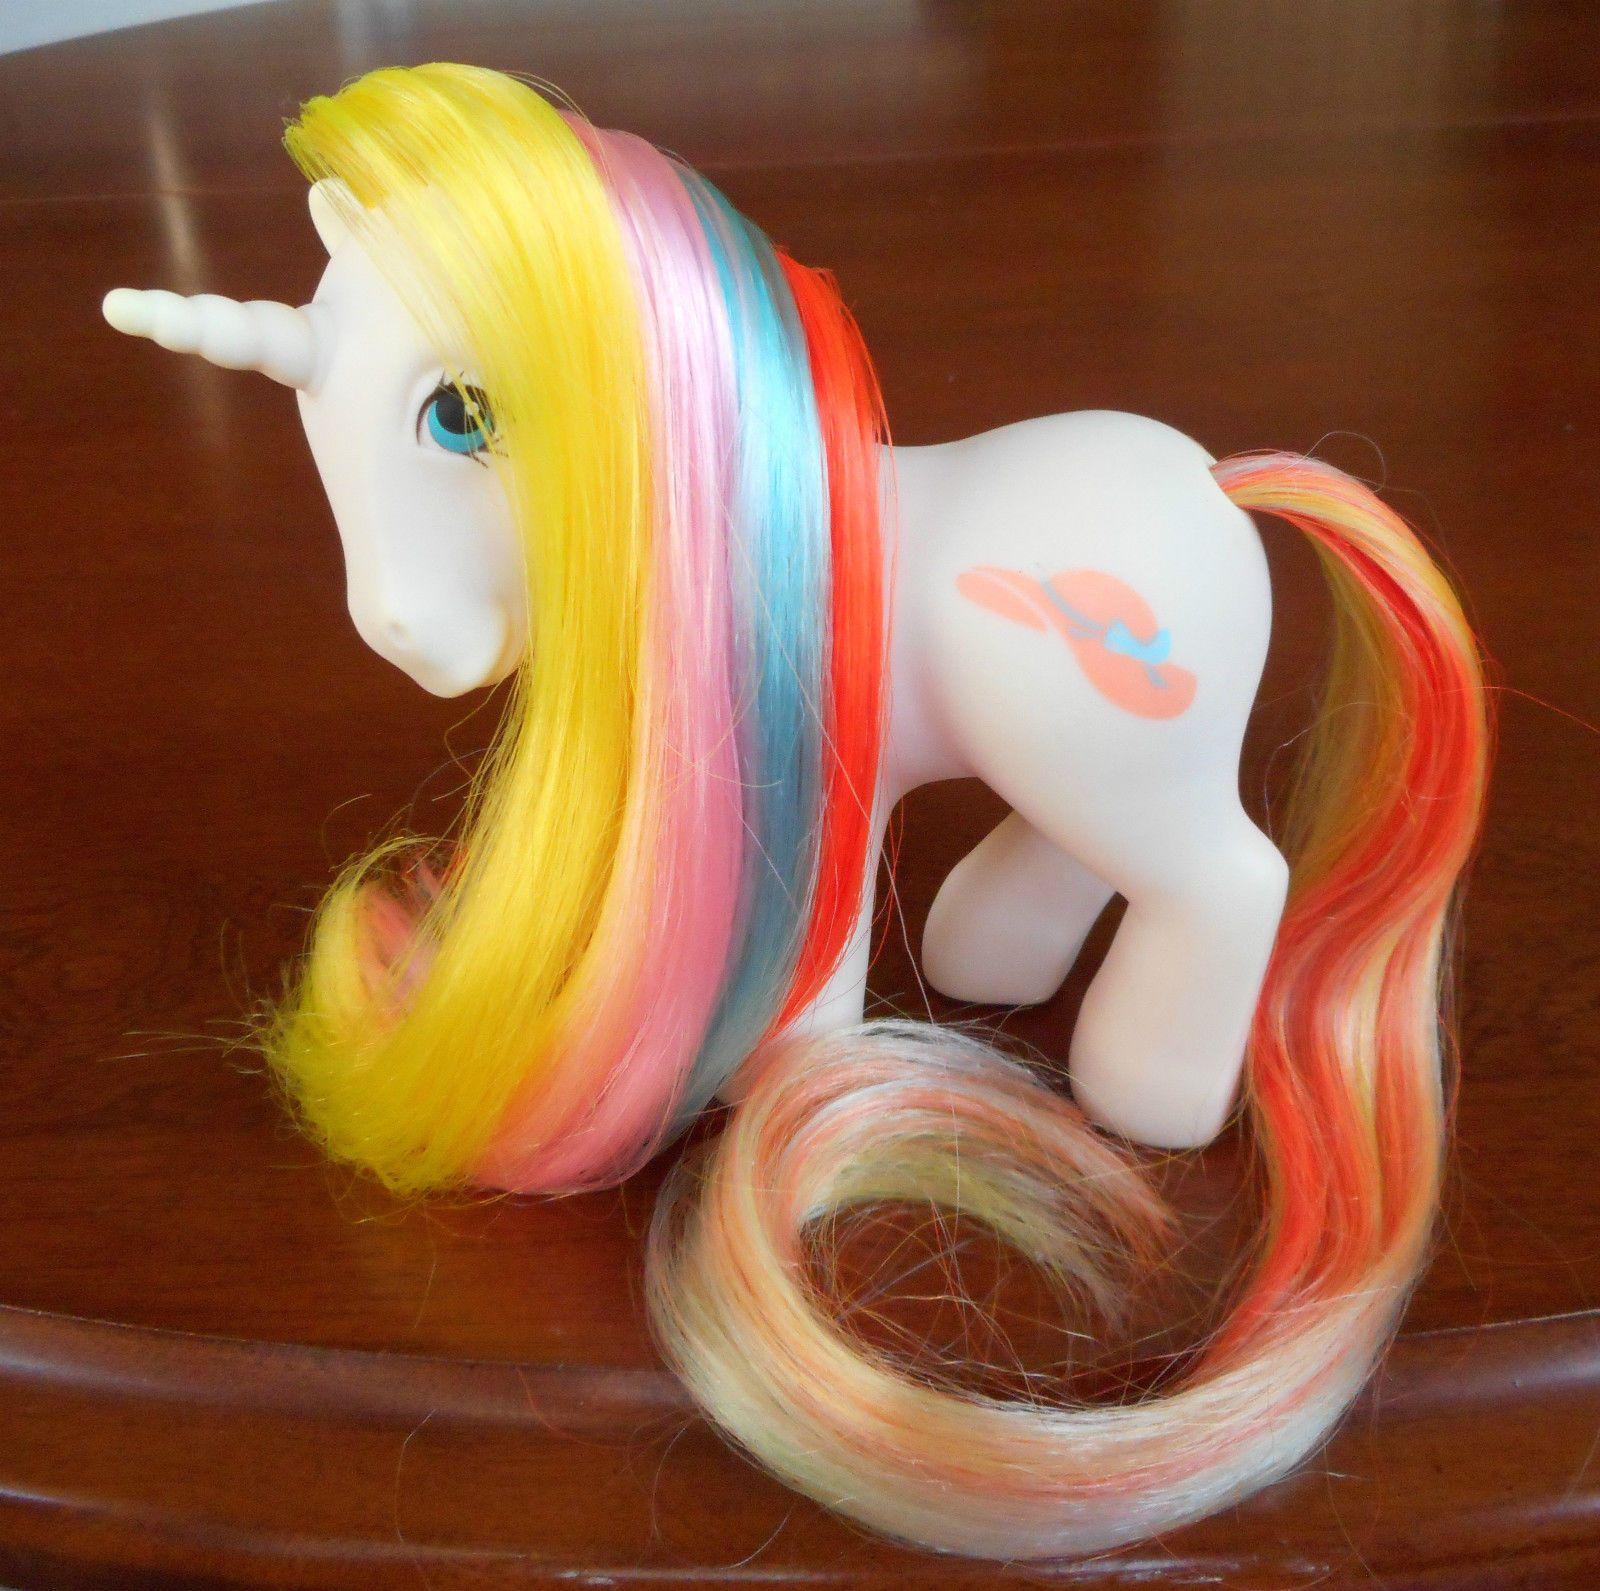 Vintage Mlp My Little Pony Brush N Grow Bouquet Near Mint Condition Ebay Mlp My Little Pony Little Pony My Little Pony